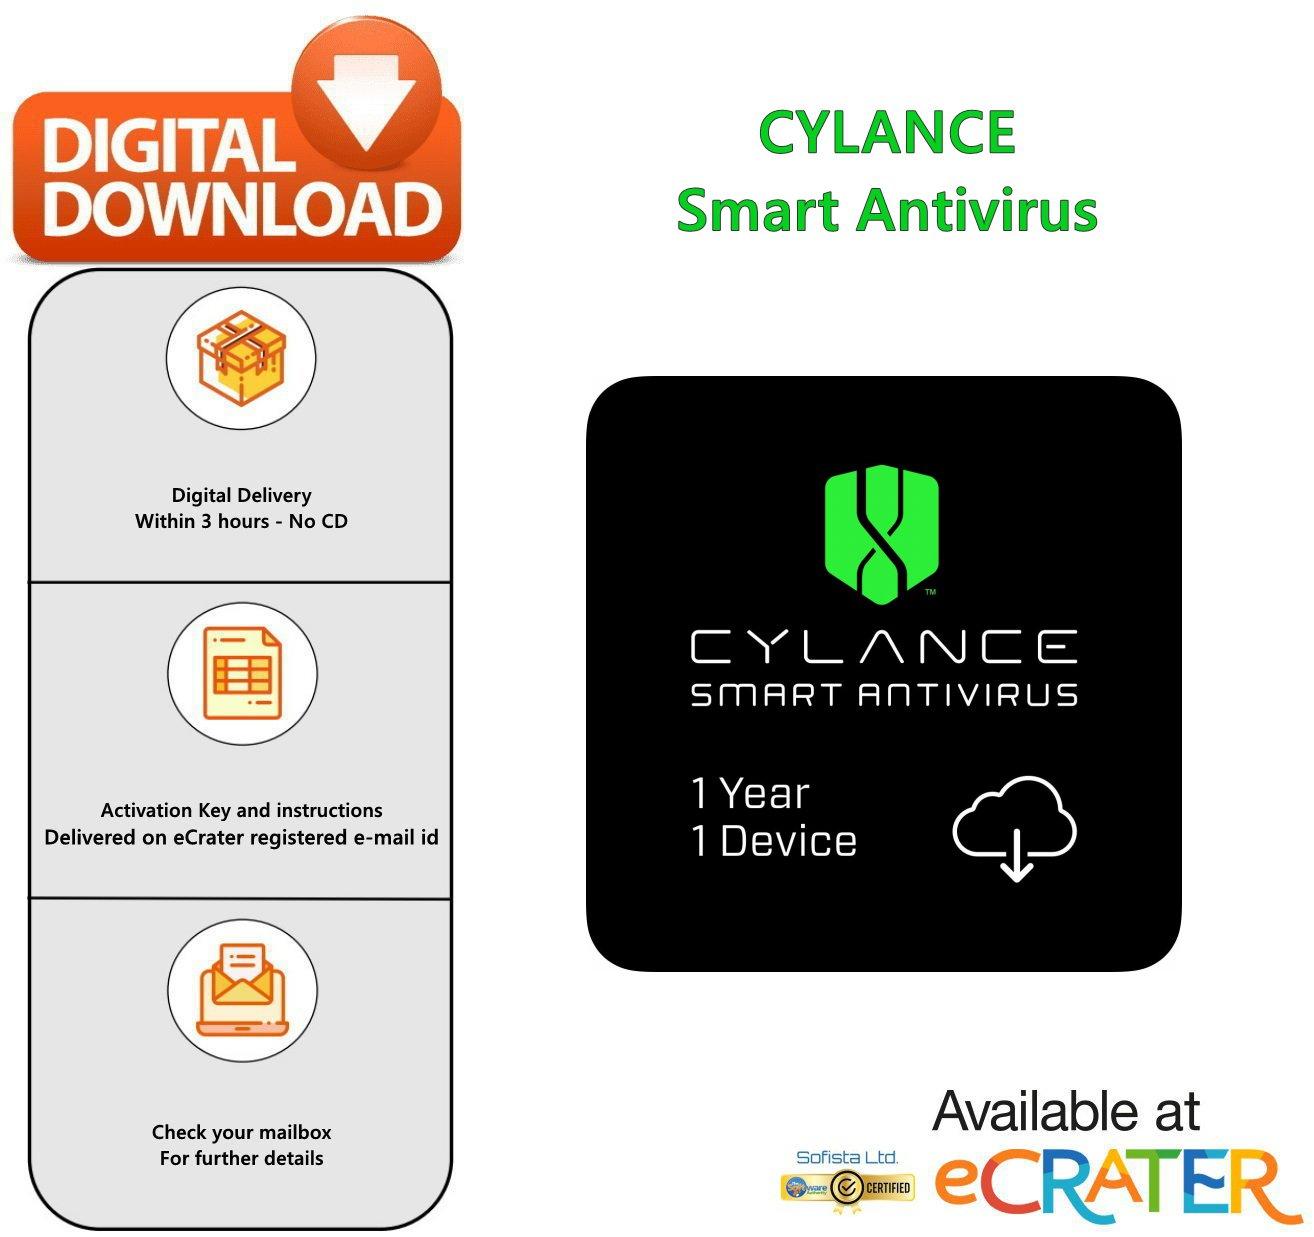 [1 Device] CYLANCE Smart Antivirus: World-class Next-gen AI Based Antivirus Protection [1 YR]